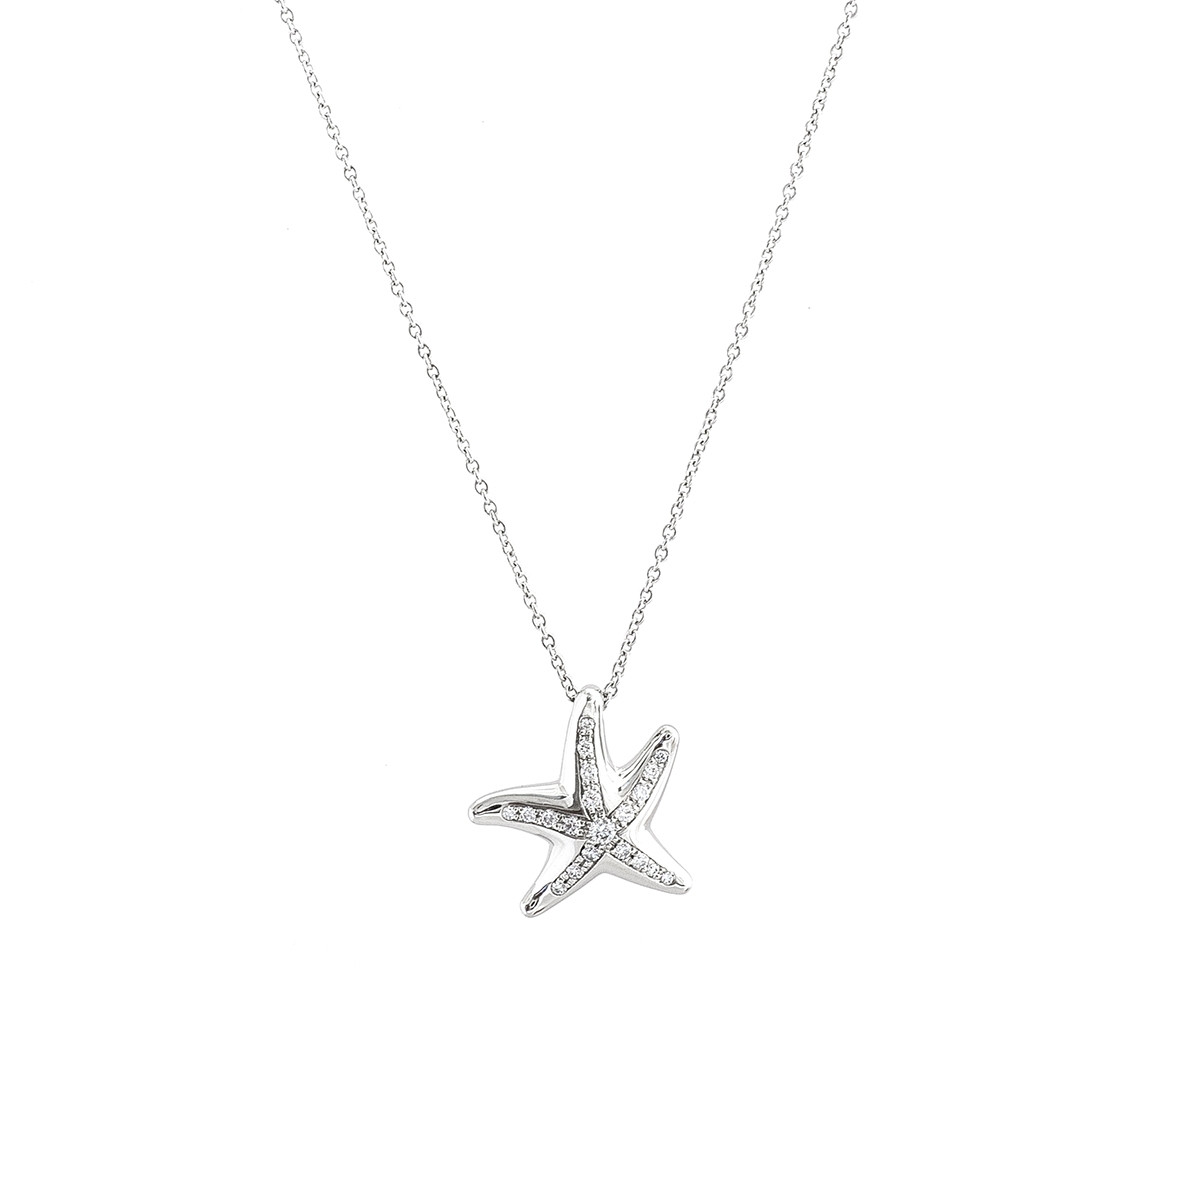 74ef5401b Vintage Tiffany & Co. Elsa Peretti 0.13 CTW Diamond Starfish ...